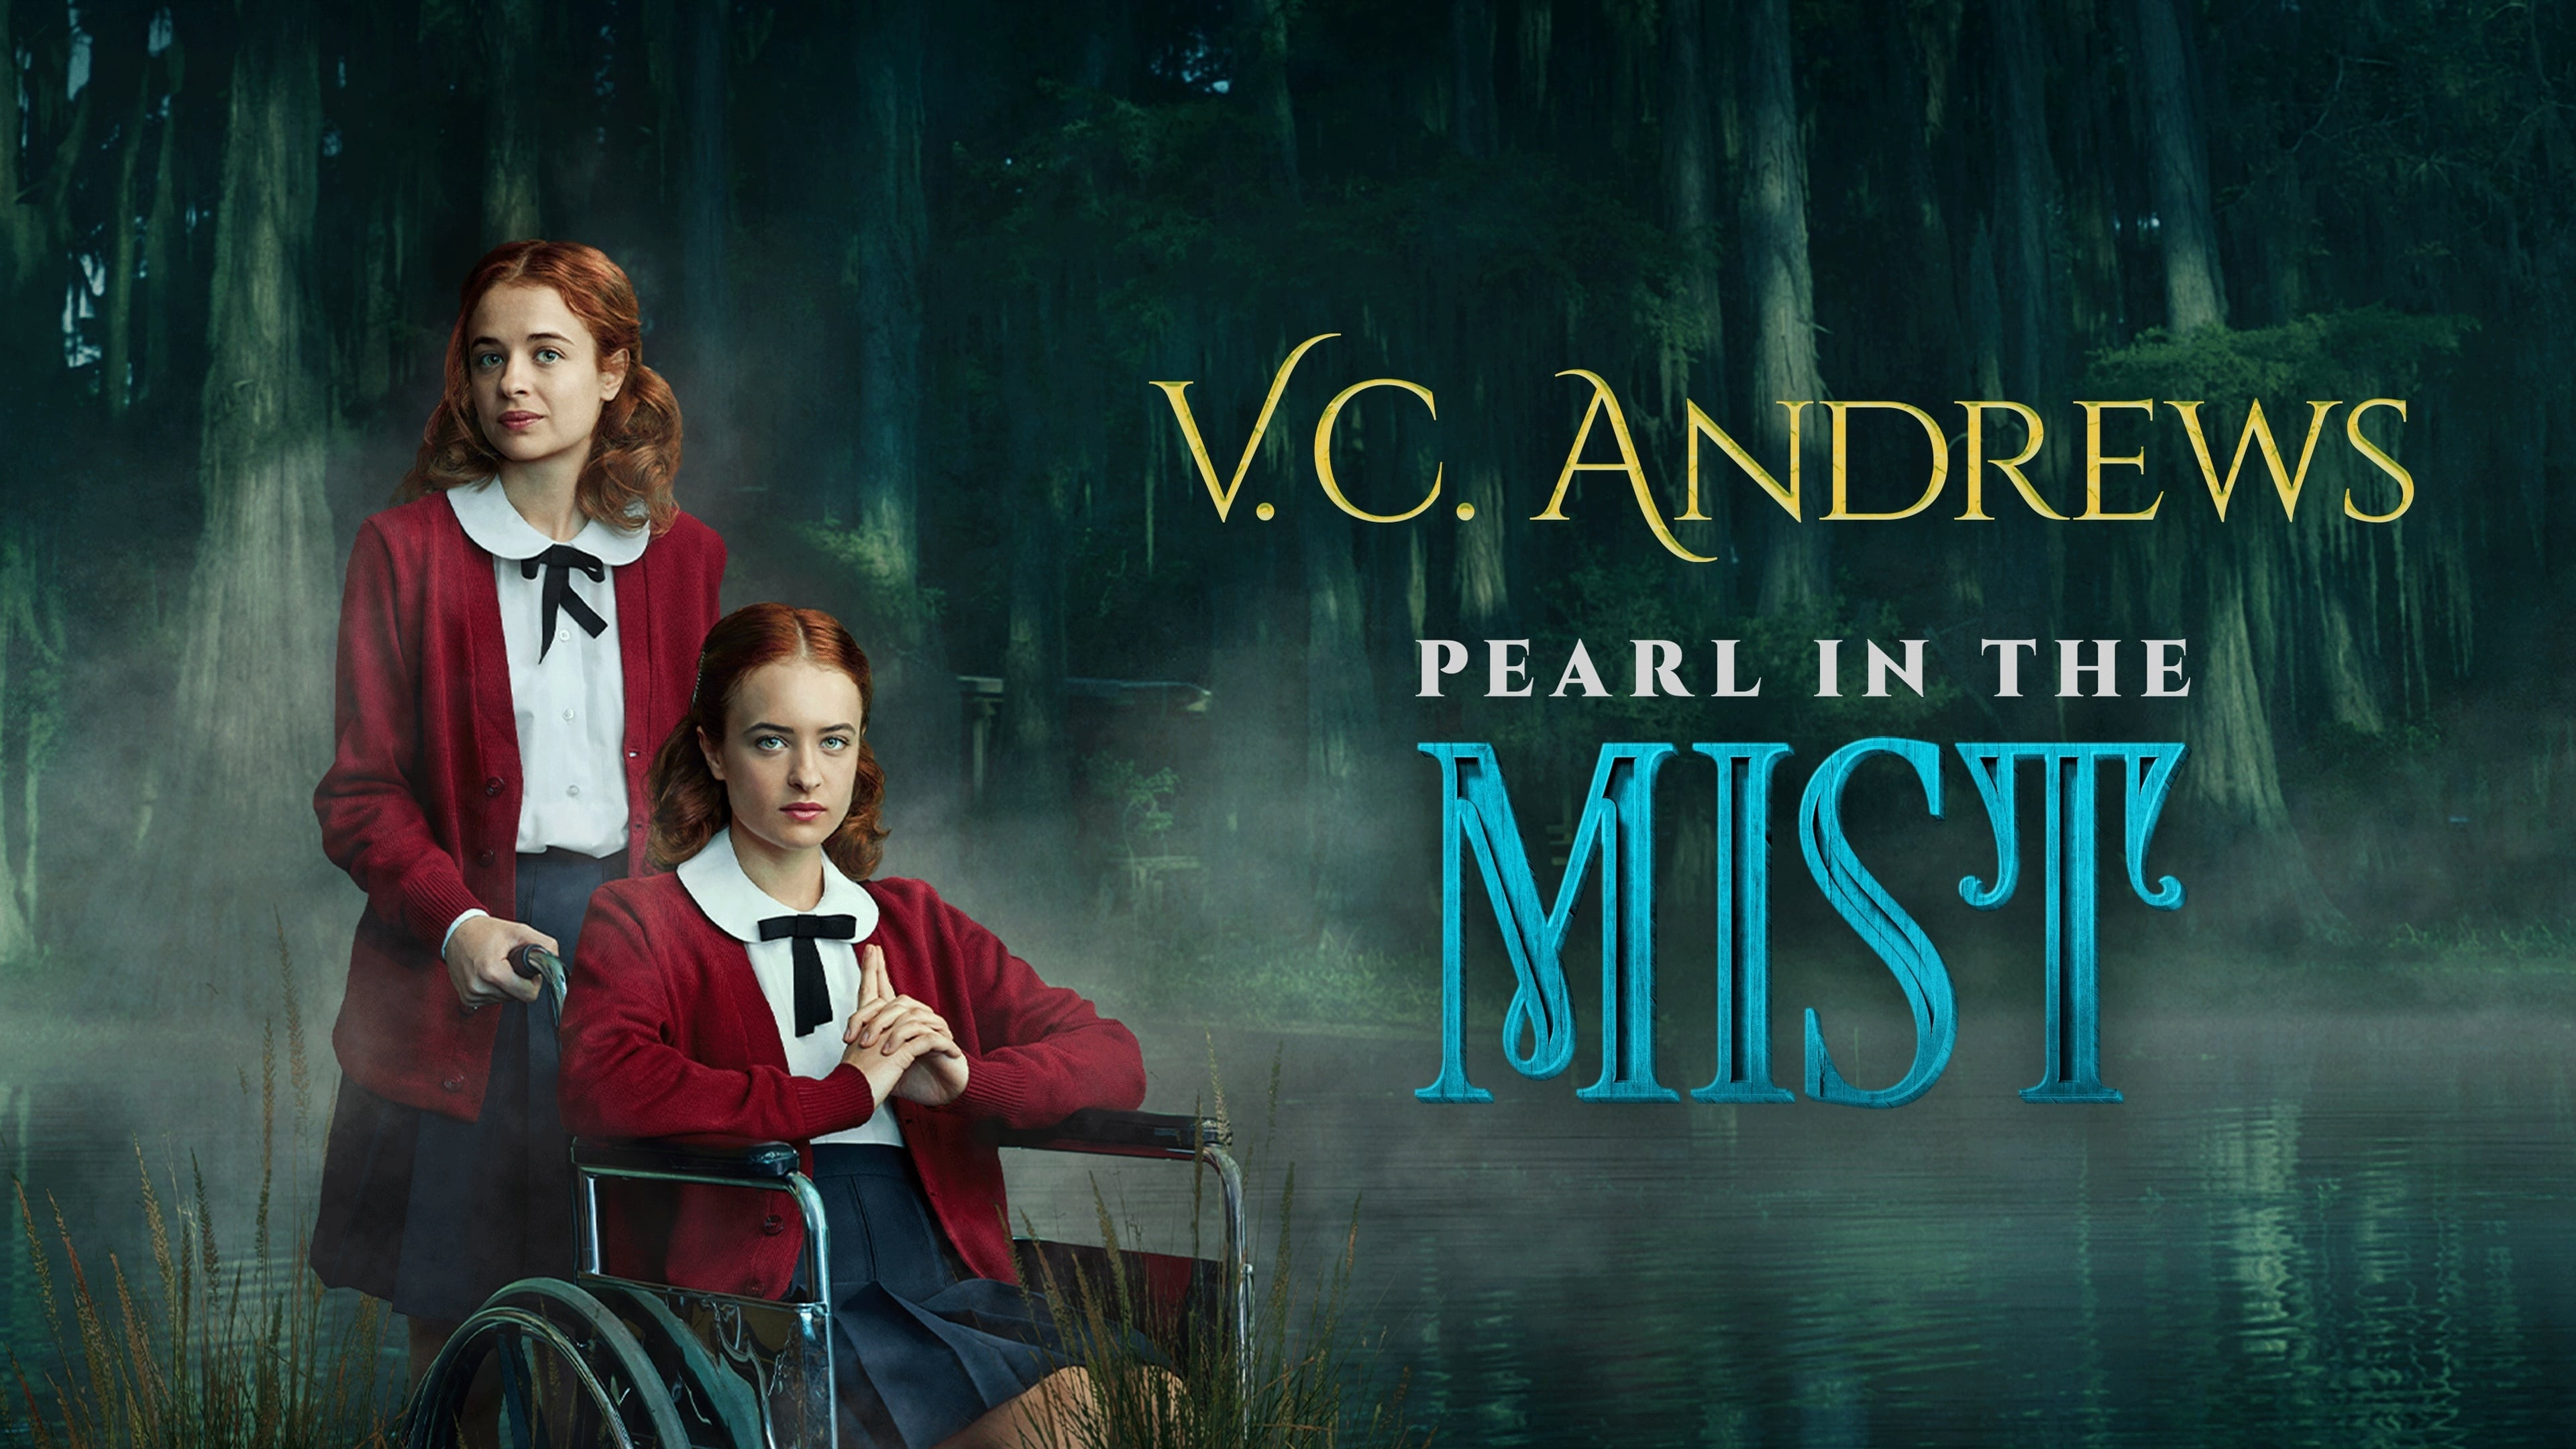 V.C. Andrews' Pearl in the Mist (2021)